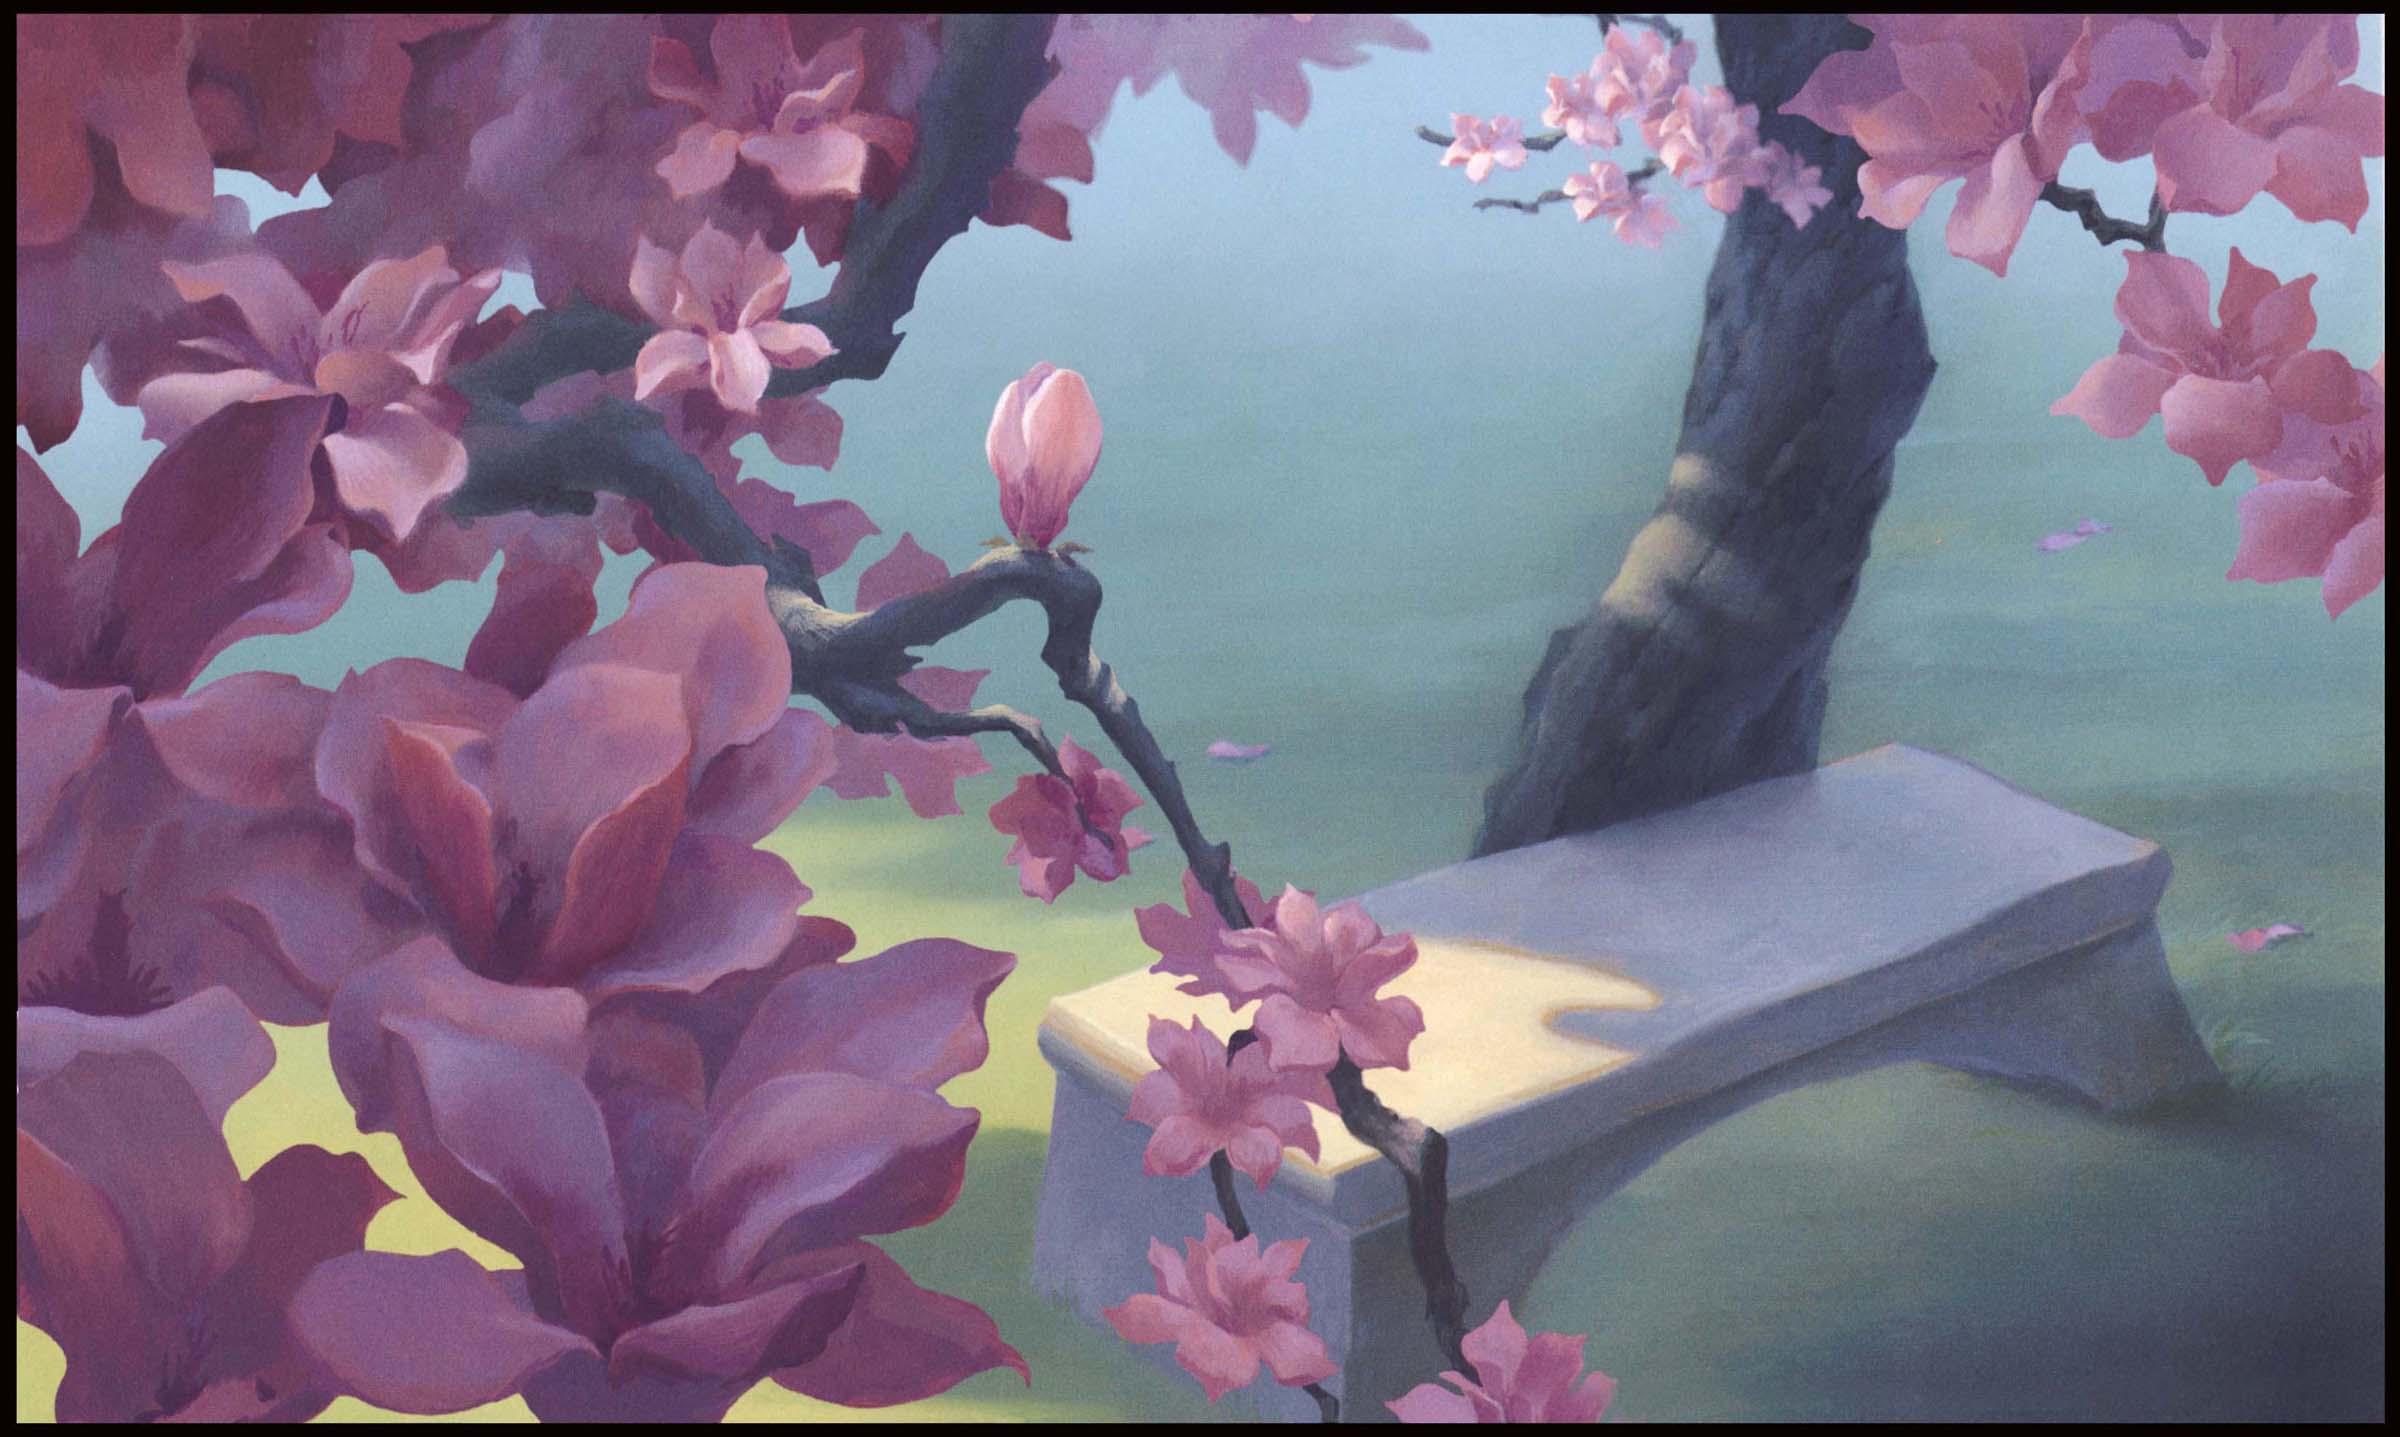 Falling Cherry Blossom Wallpaper Hd Mulan Backgrounds Wallpaper Cave